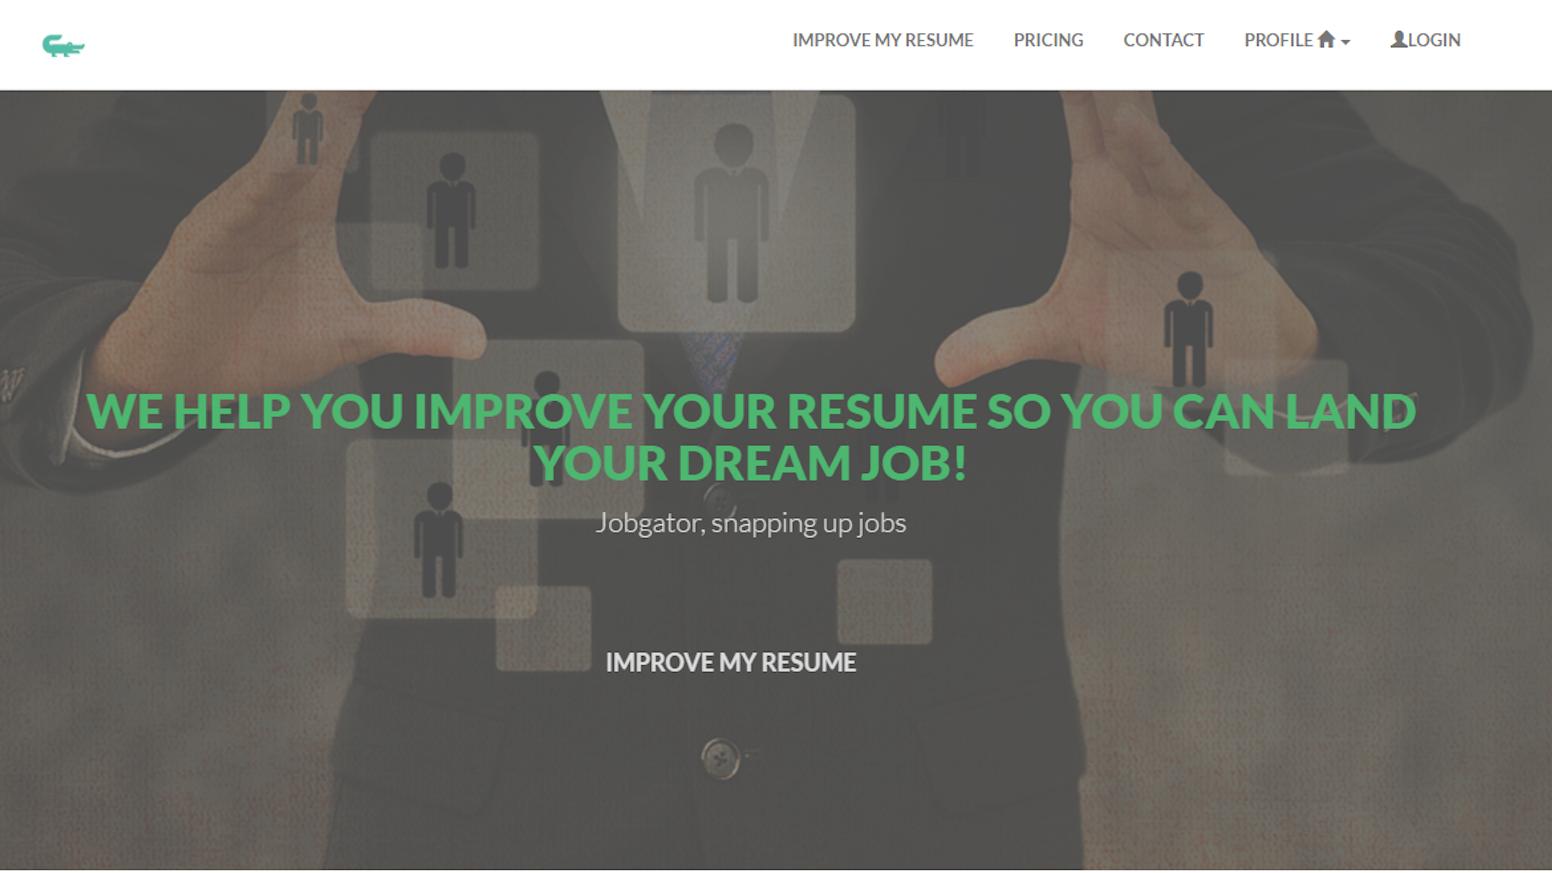 jobgator the easier way to get your dream job by benjamin gelb